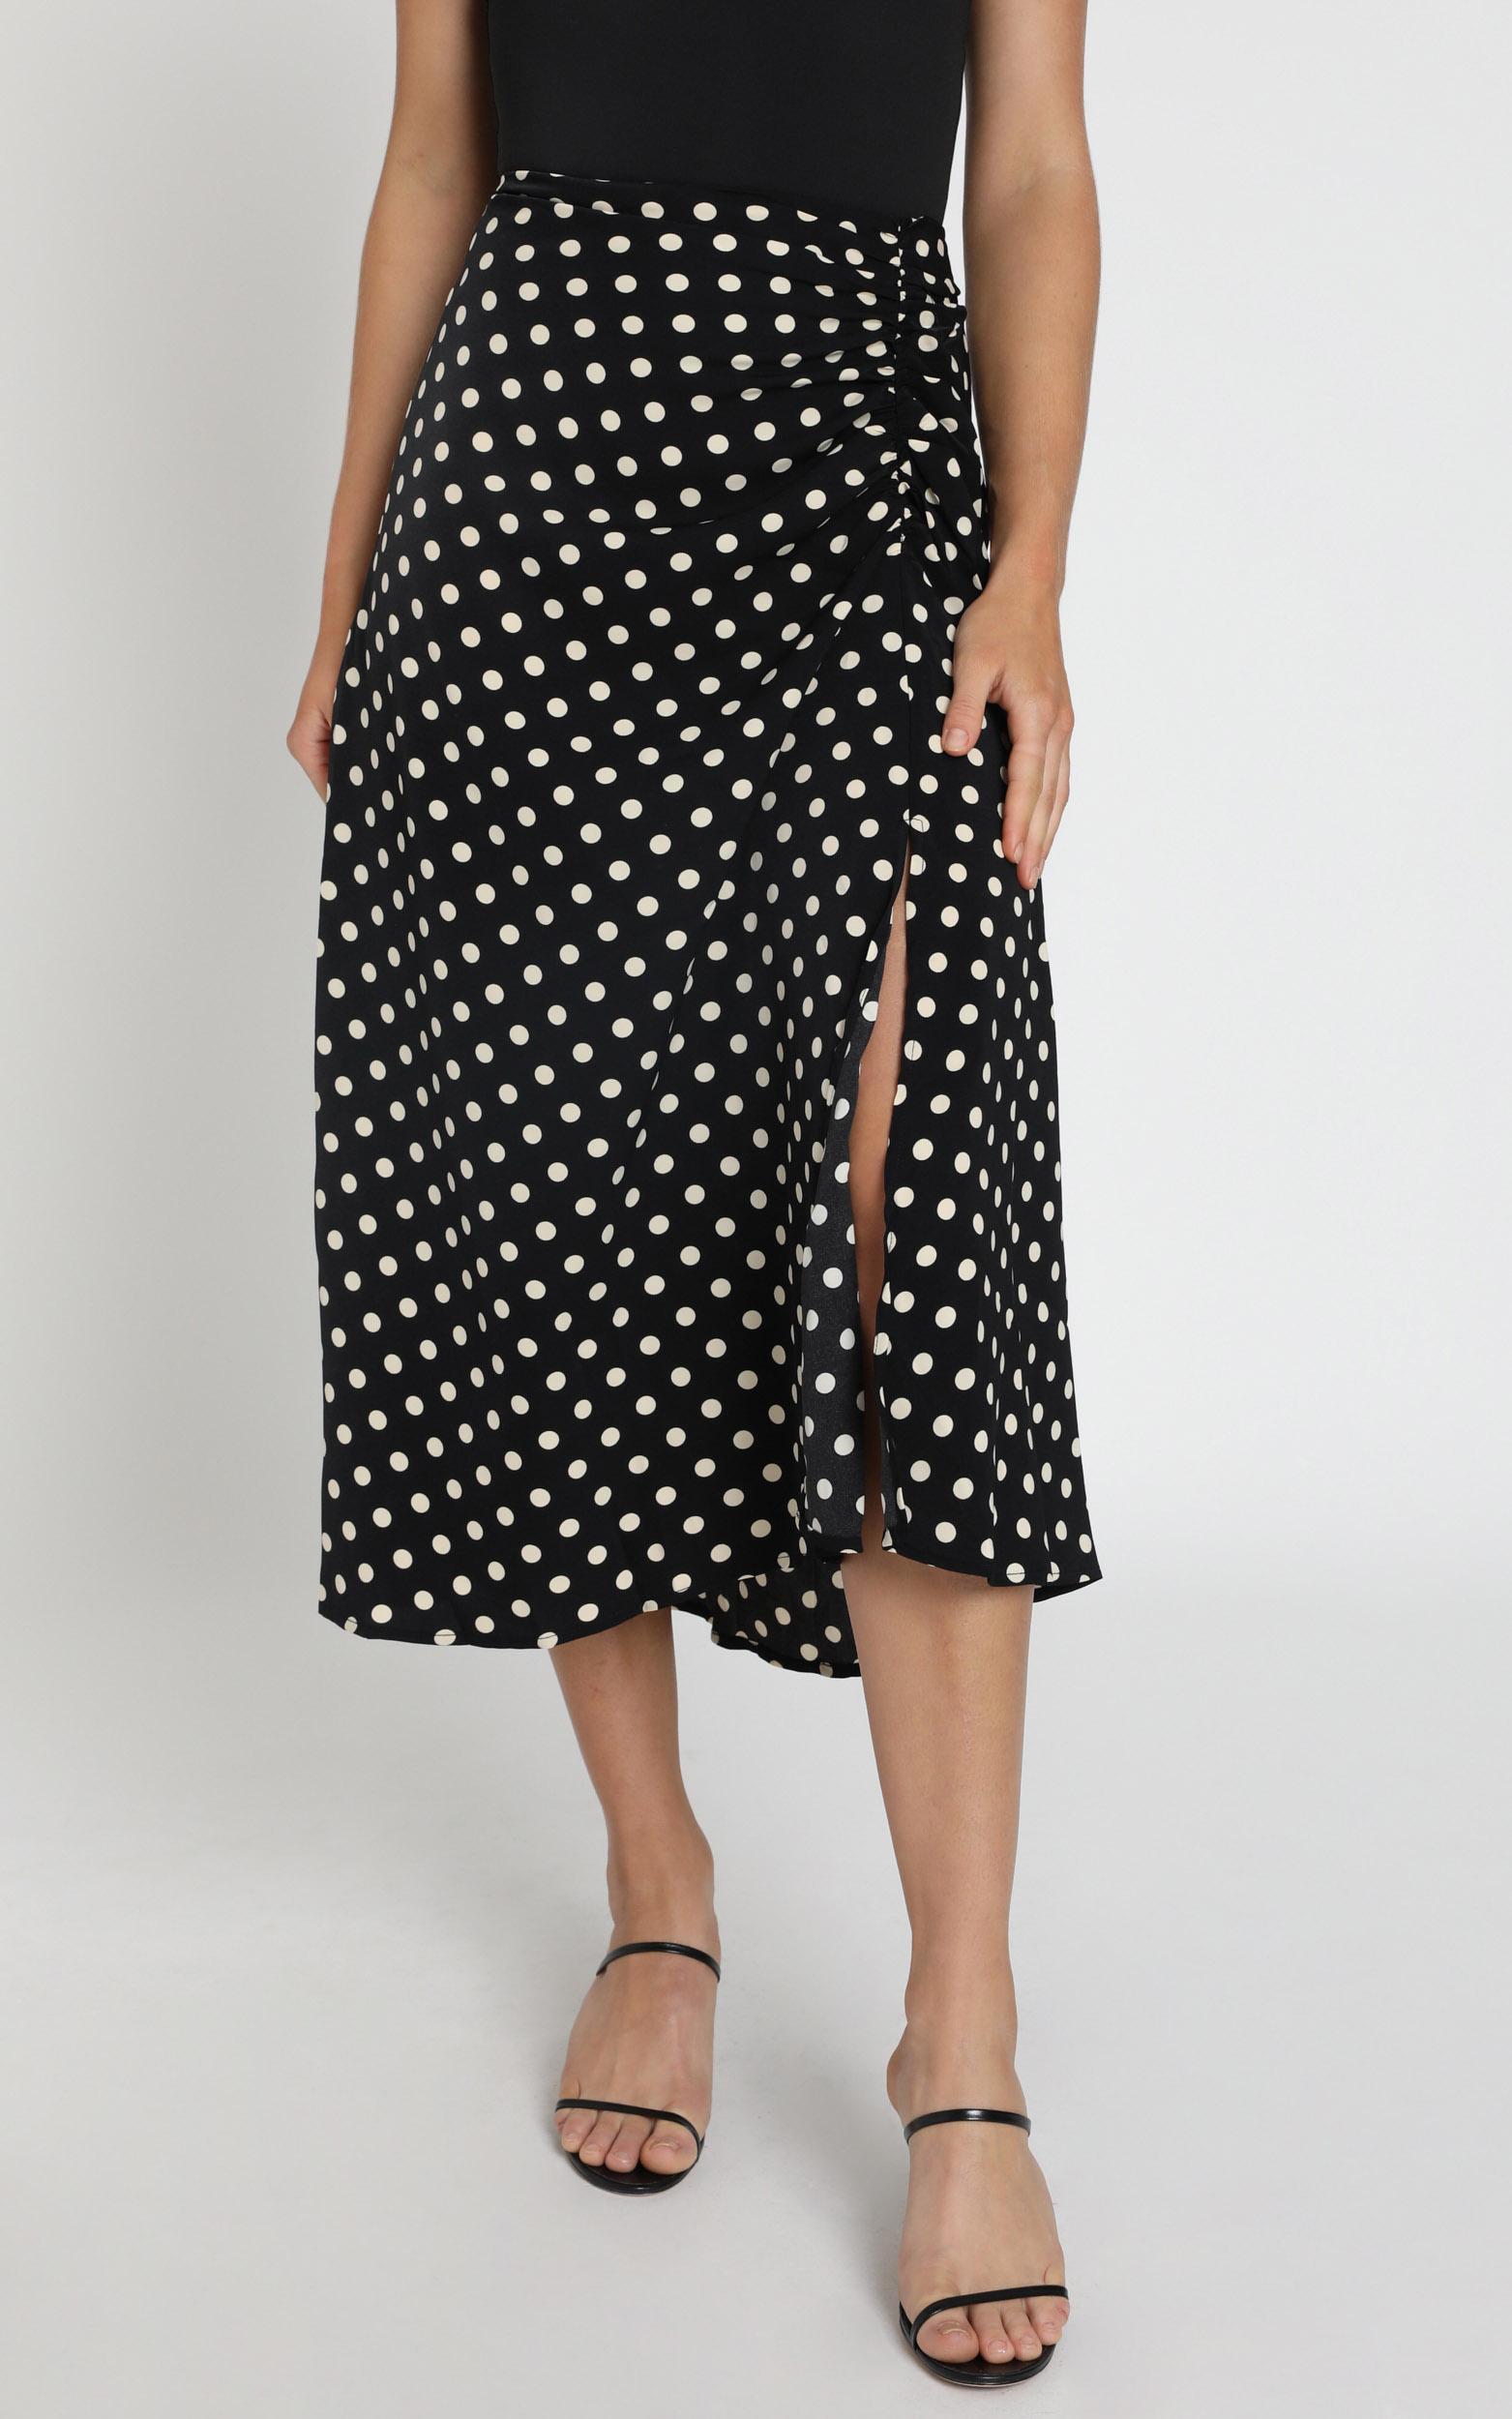 Kayleigh Skirt in black spot - 6 (XS), Black, hi-res image number null